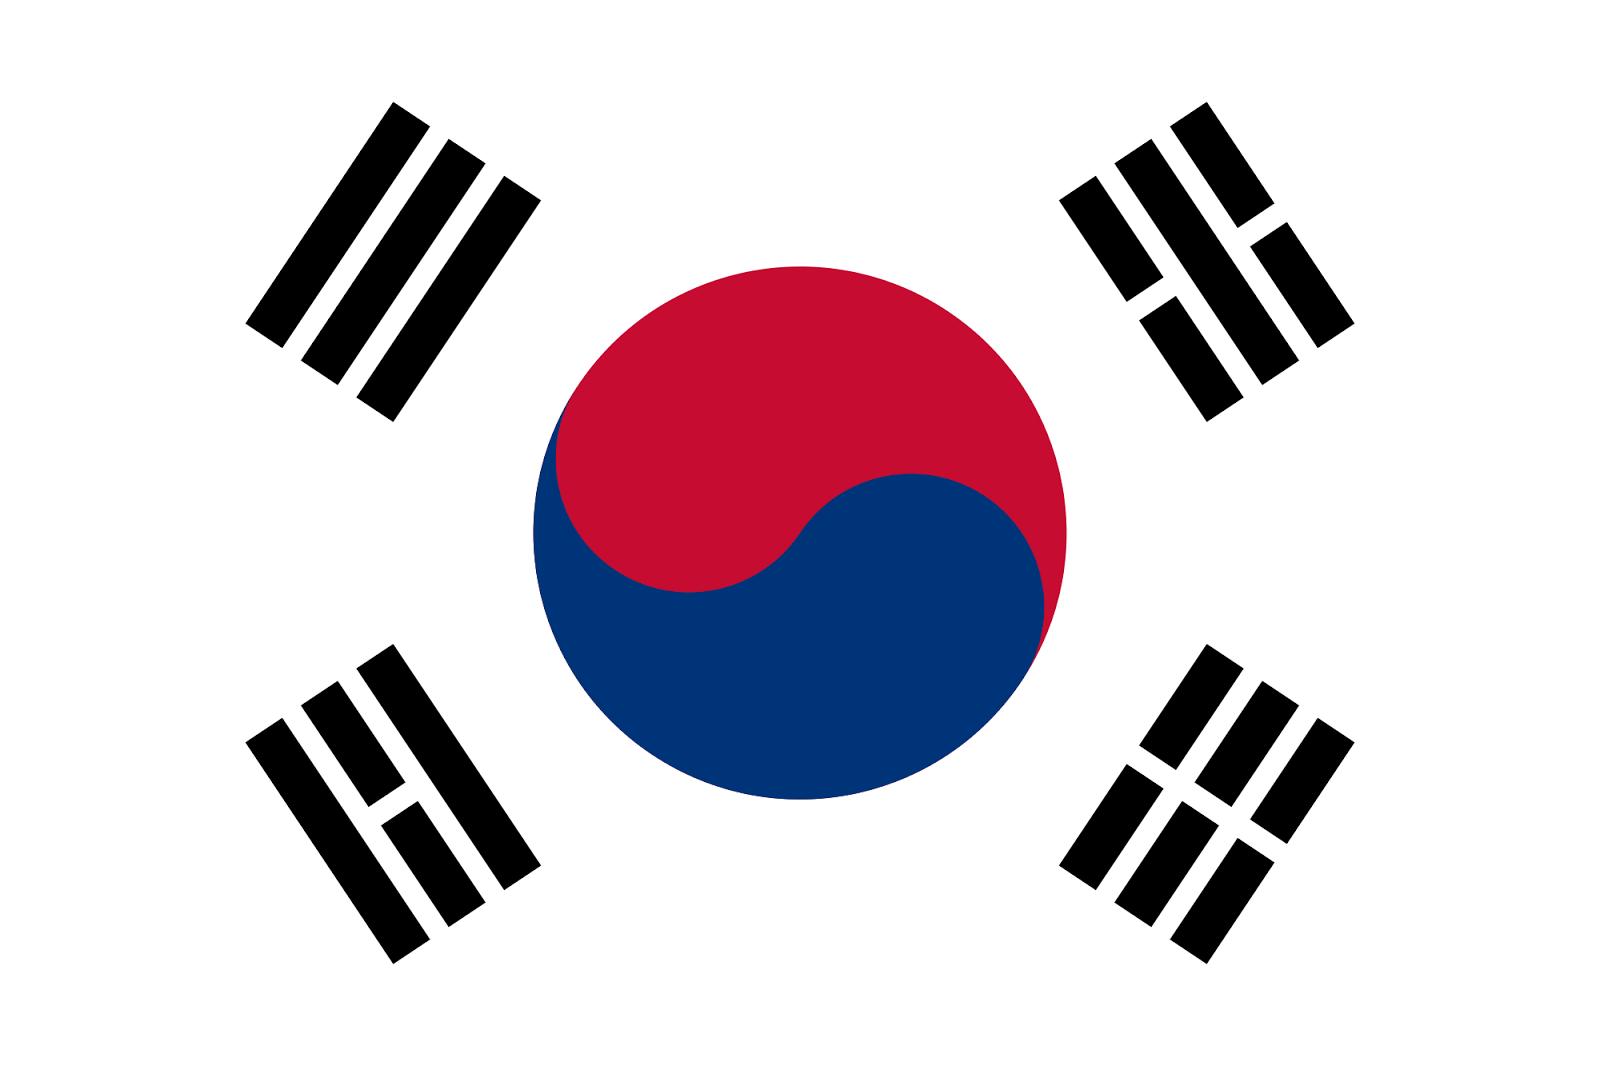 http://carbrandsincurrentproduction.blogspot.com.es/search/label/Korea